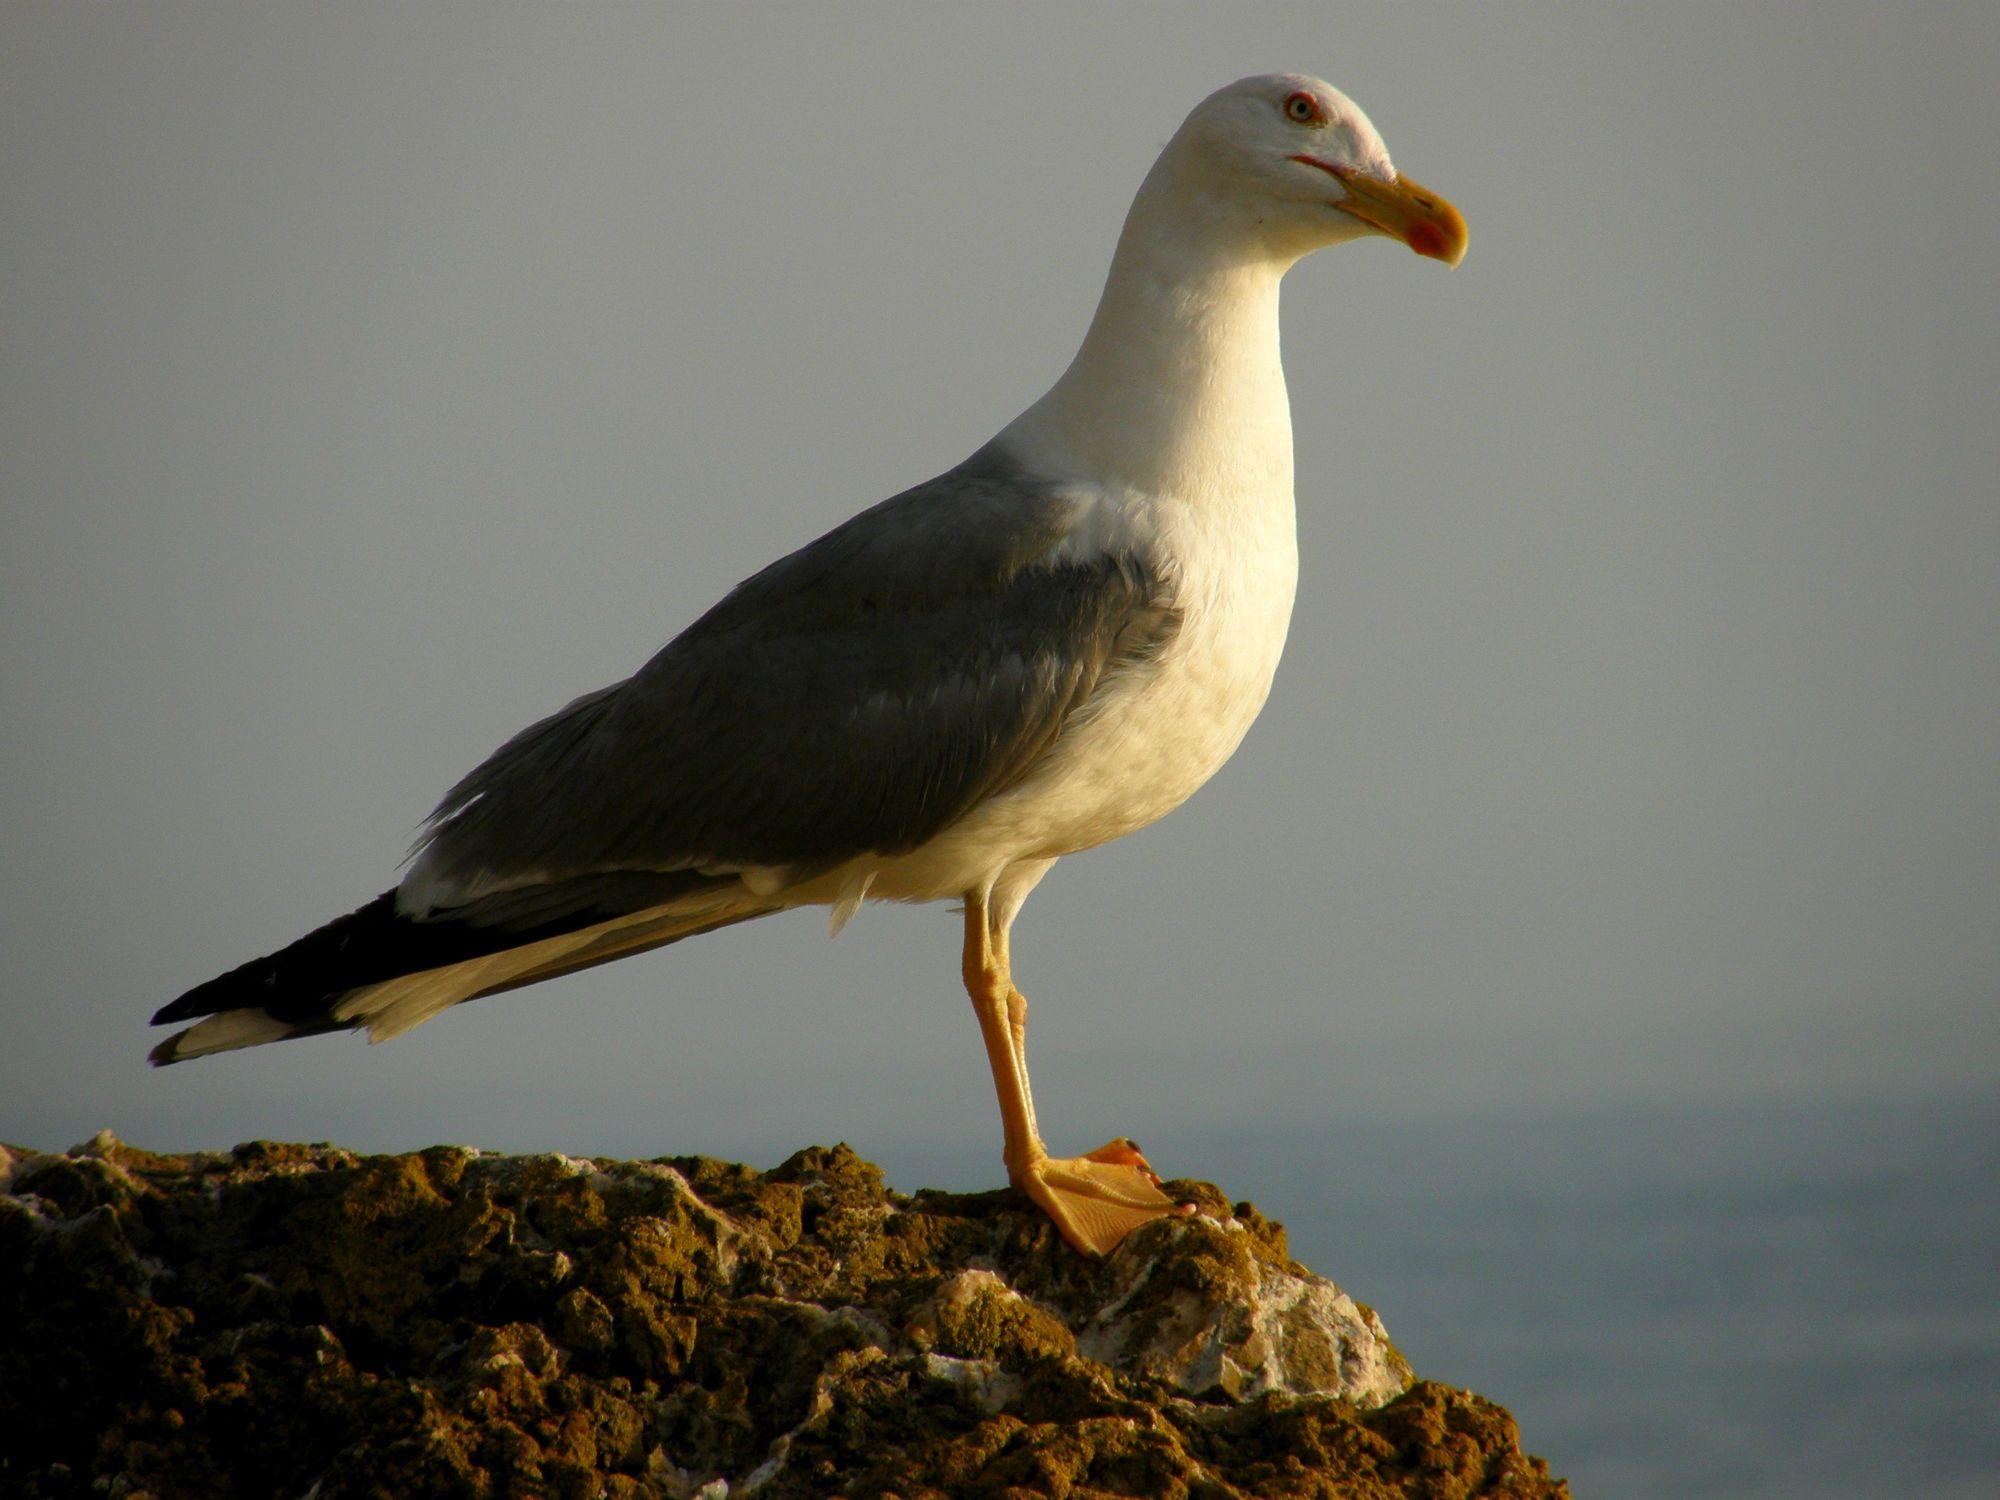 Bild mit Tiere, Vögel, Möwen, Meer, Tier, Möwe, Möve, Tierwelt, Möven